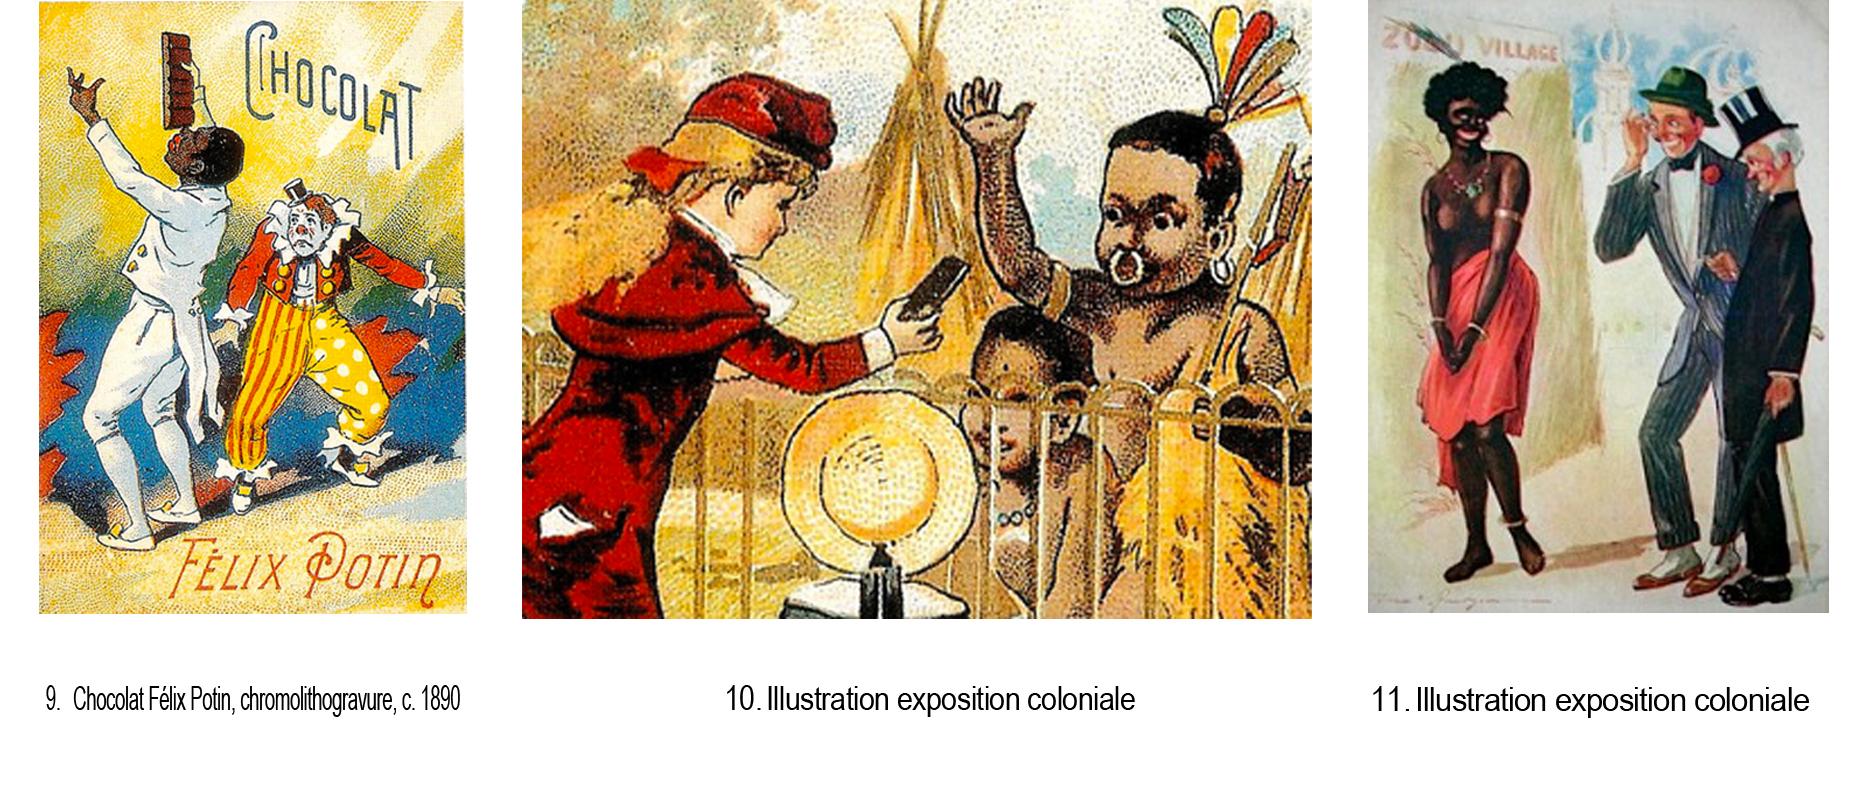 images-expo-coloniale-pour-web.jpg